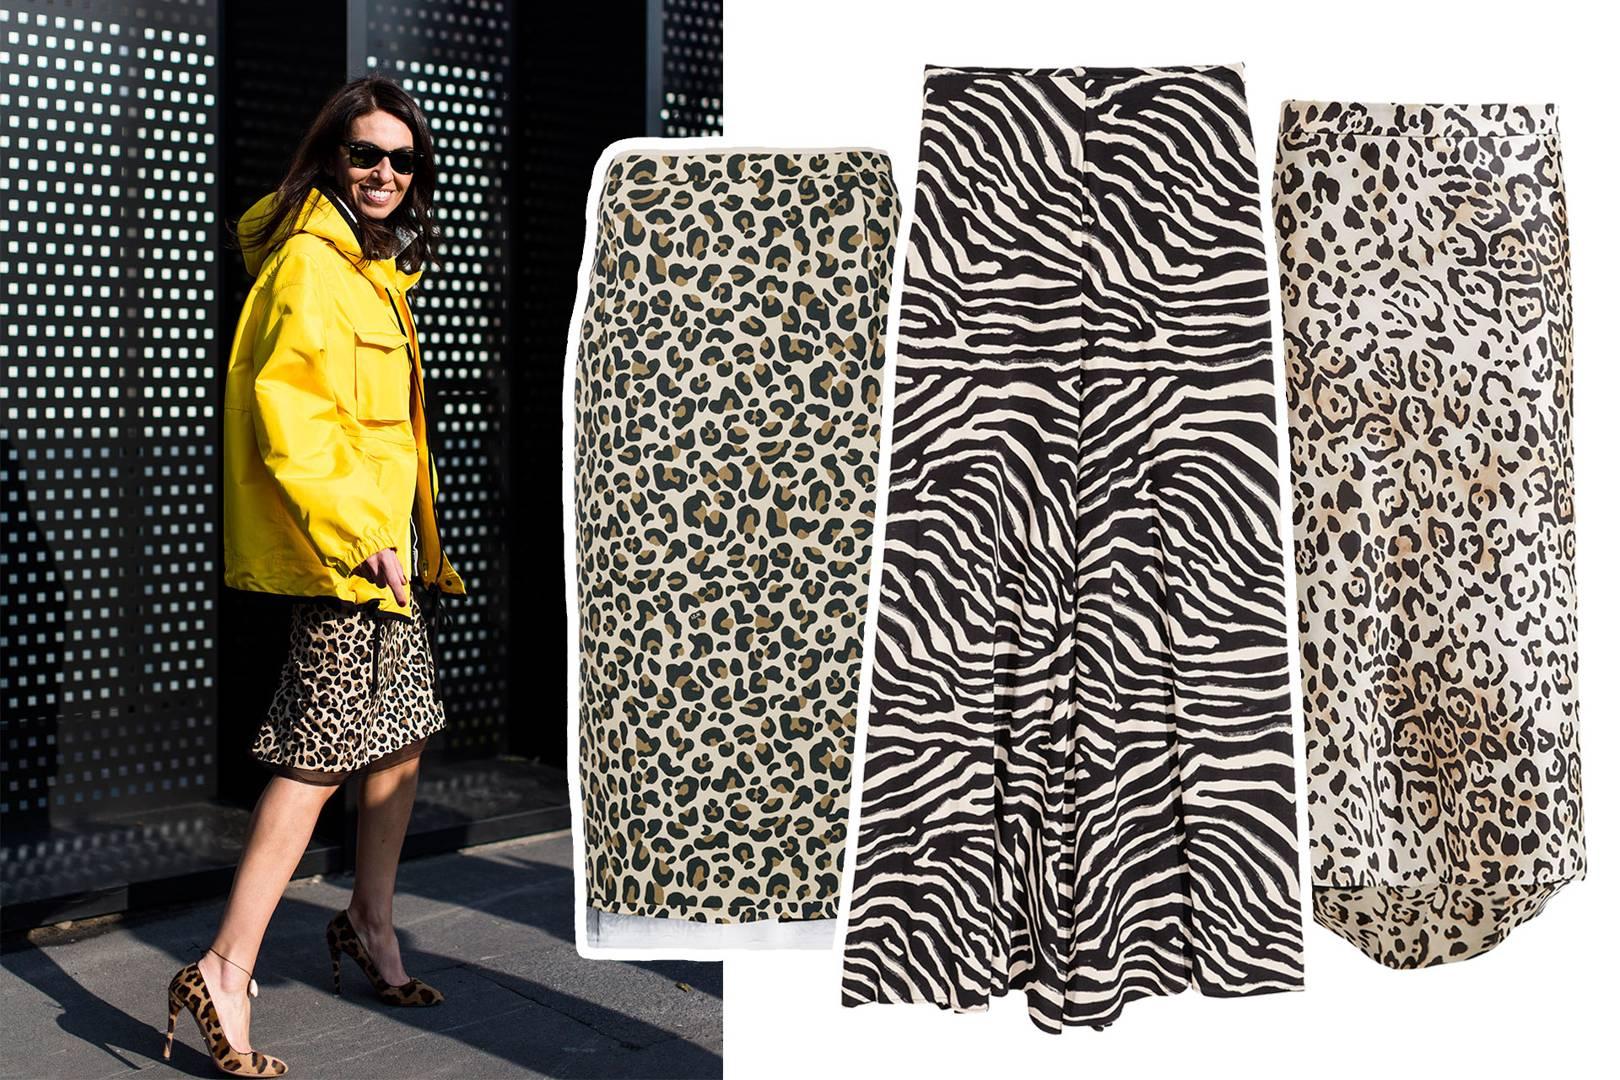 ddeabff69d Shop The Street Style: Animal Print | British Vogue